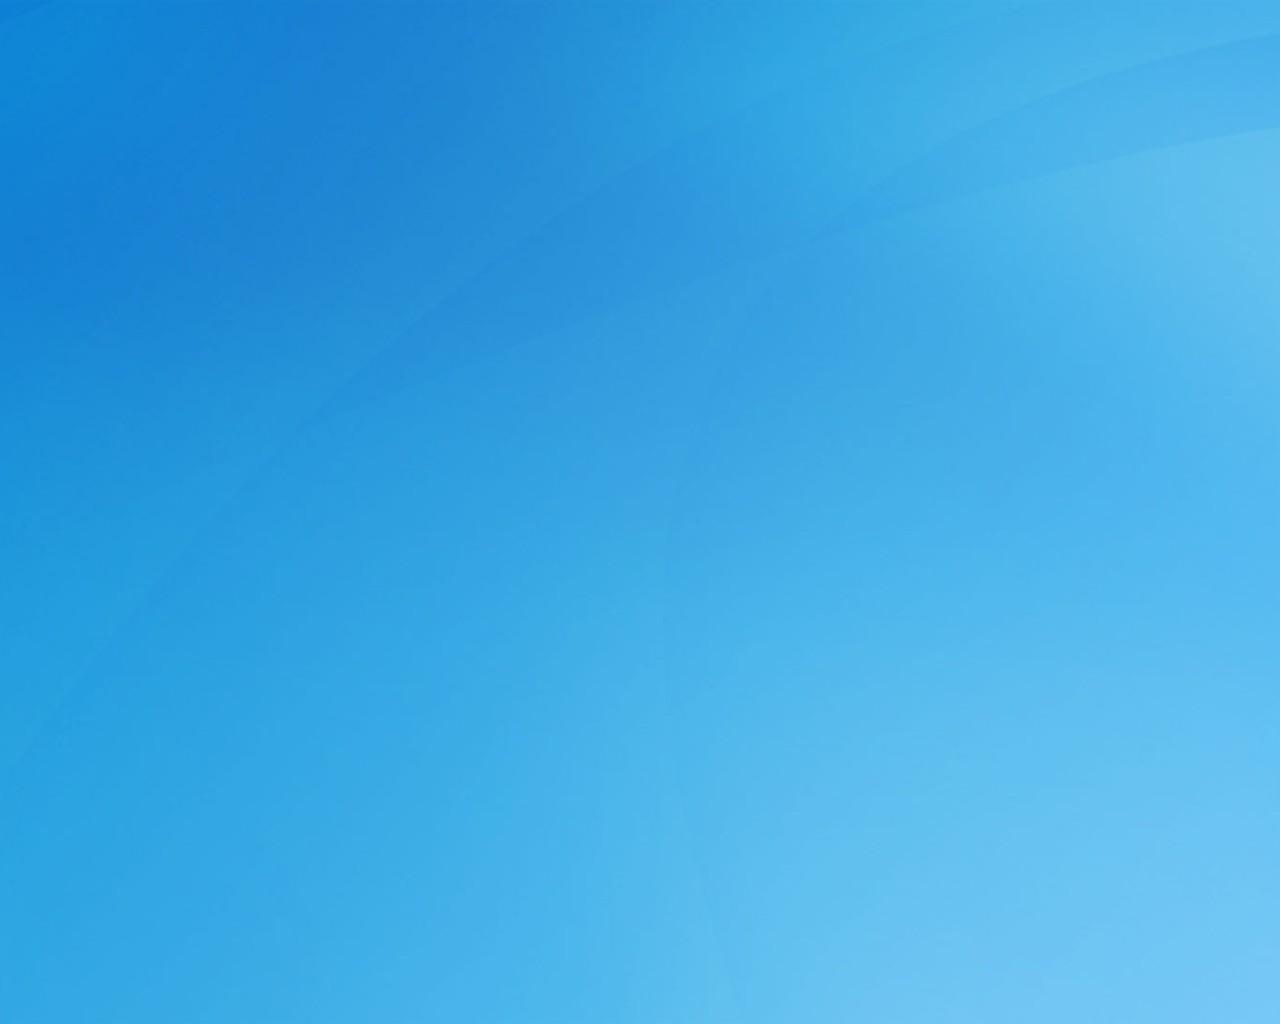 9000 Wallpaper Hd Warna Biru HD Terbaik